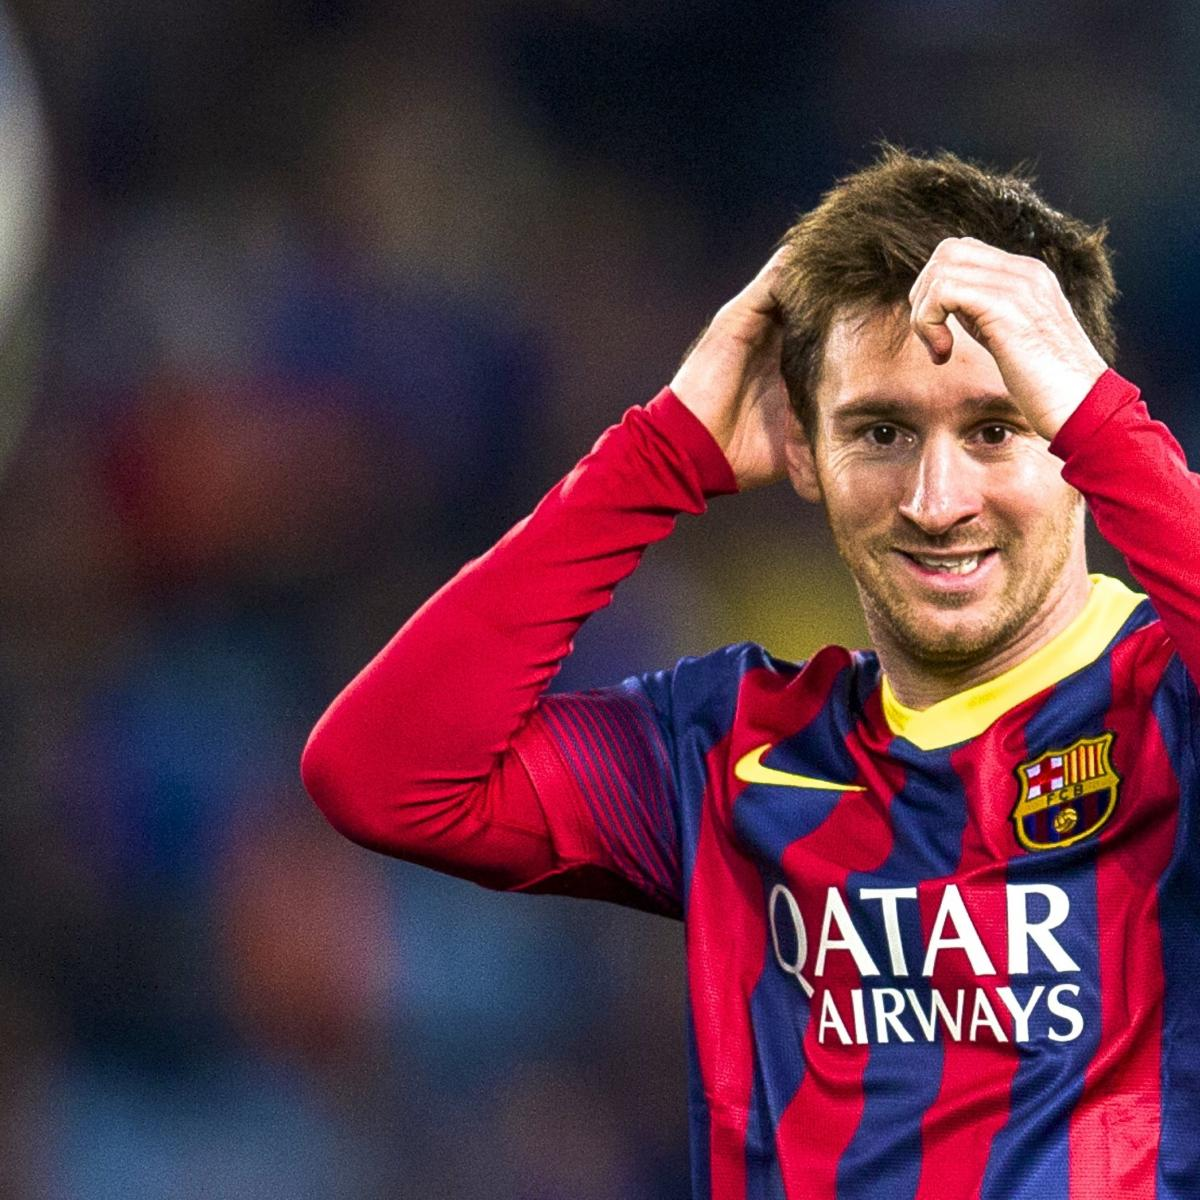 Arsenal Vs Barcelona Live Score Highlights From: Barcelona Vs. Almeria: La Liga Live Score, Highlights